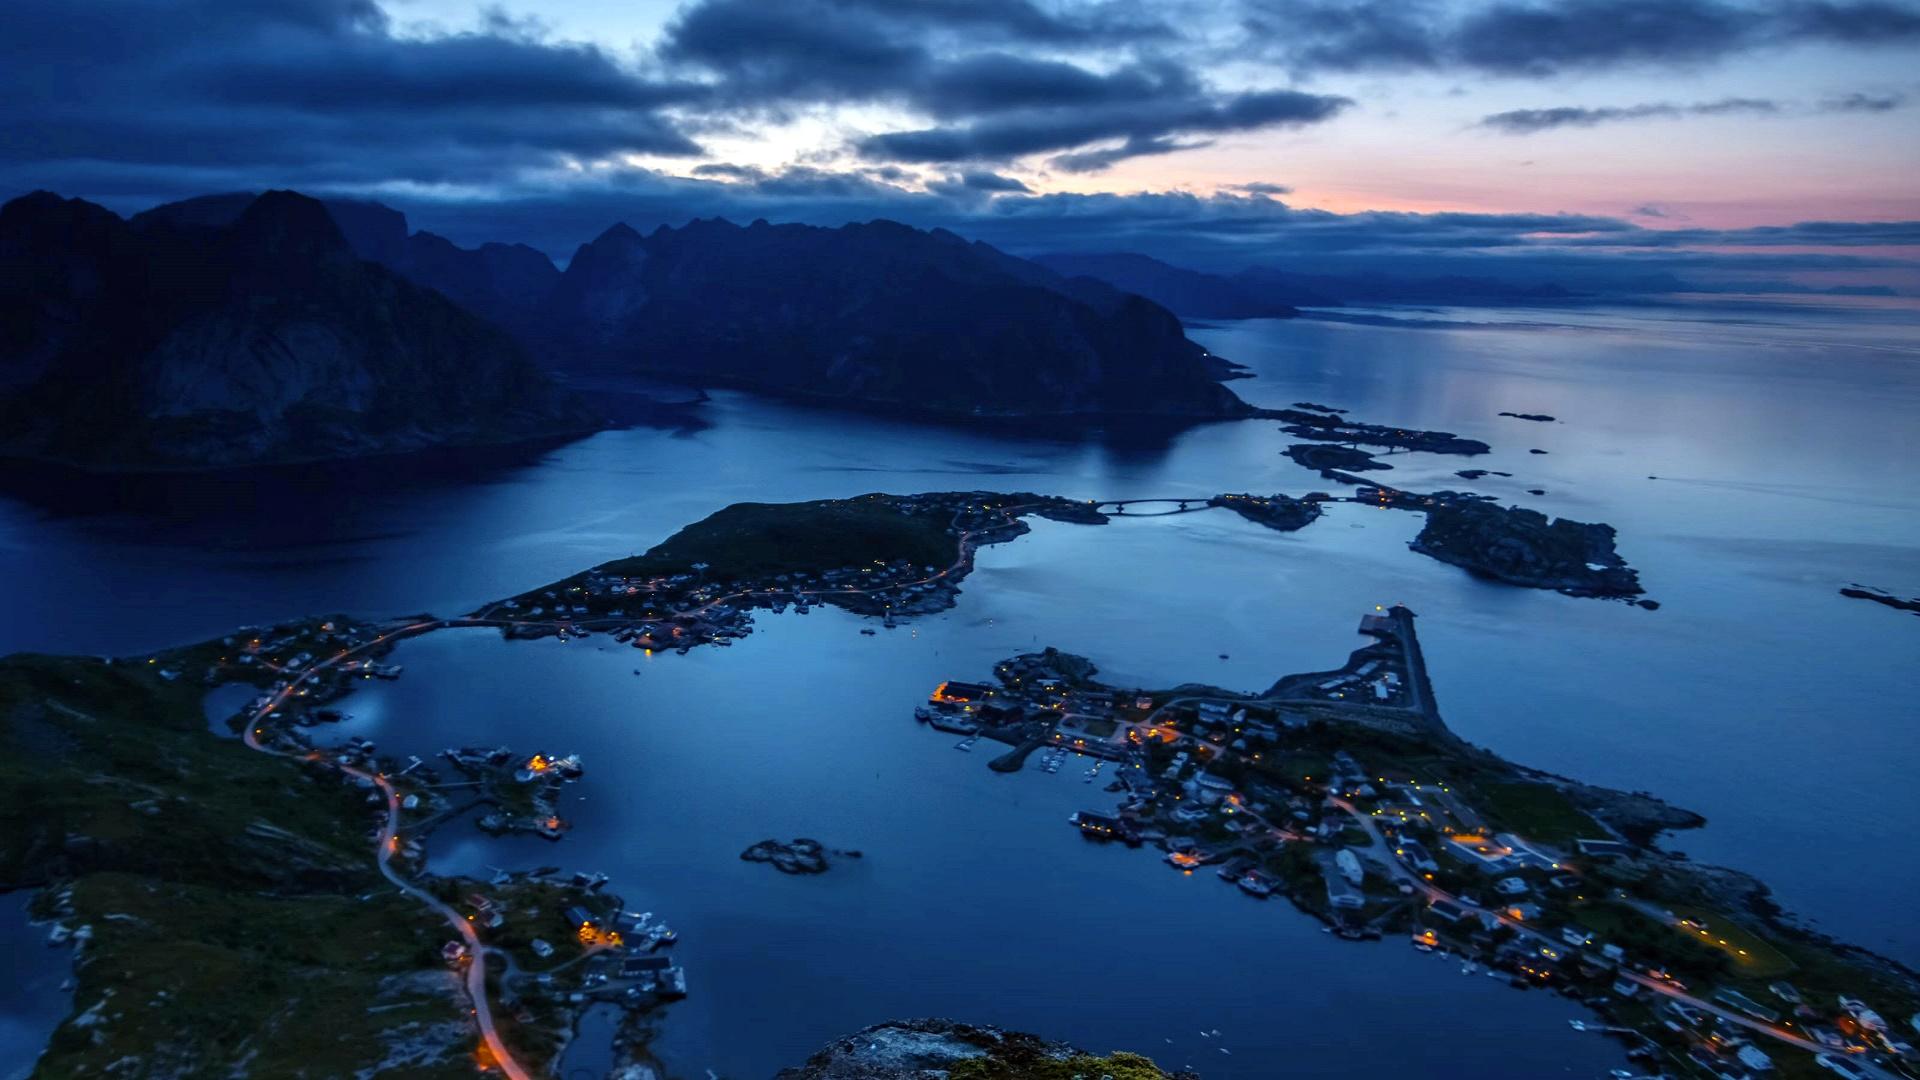 Lofoten Islands at dusk wallpaper